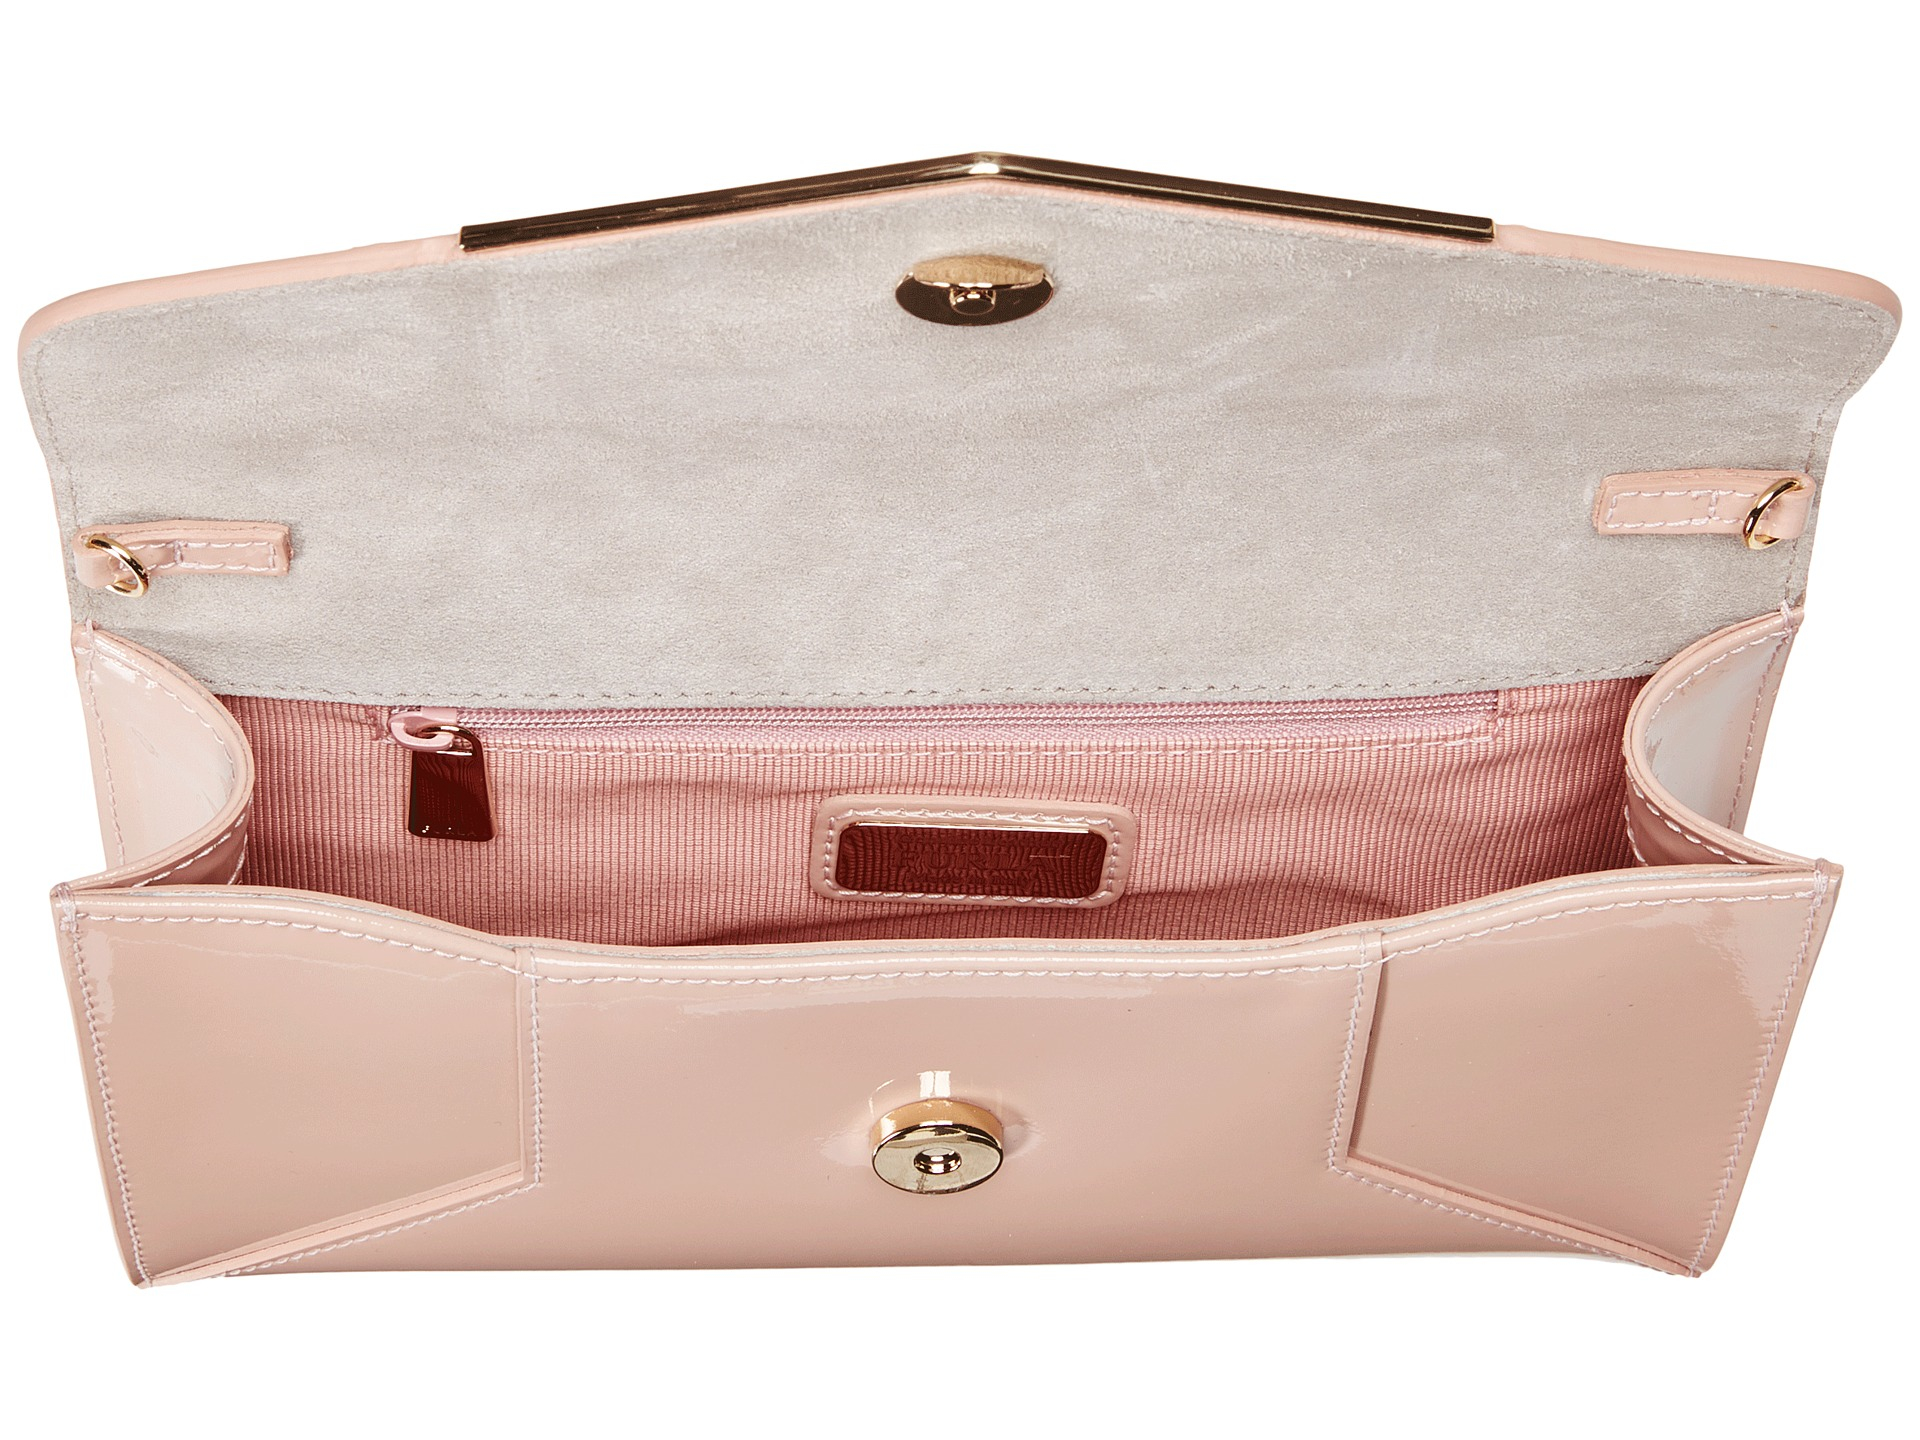 83f234c1a262 Lyst - Furla Cherie Small Envelope Pochette in Pink